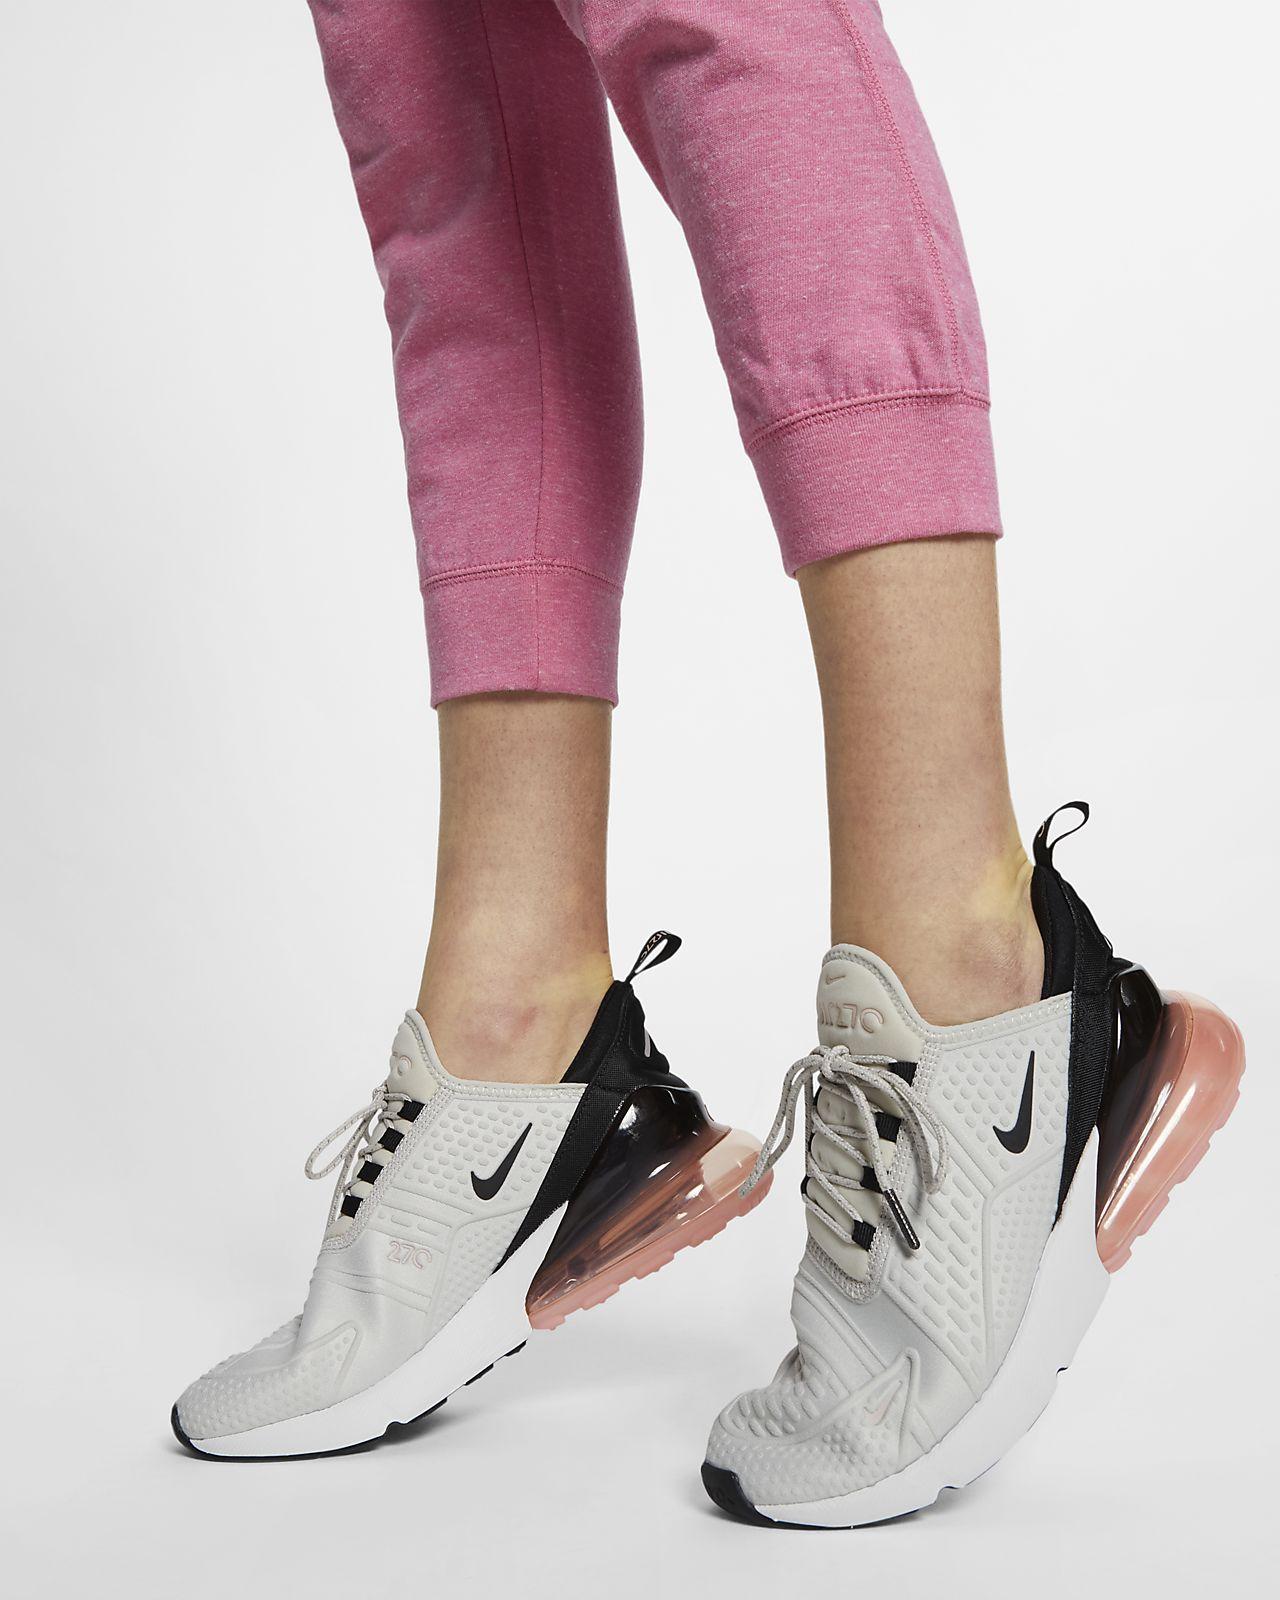 288606a2da84a Nike Sportswear Gym Vintage Women s Jumpsuit. Nike.com